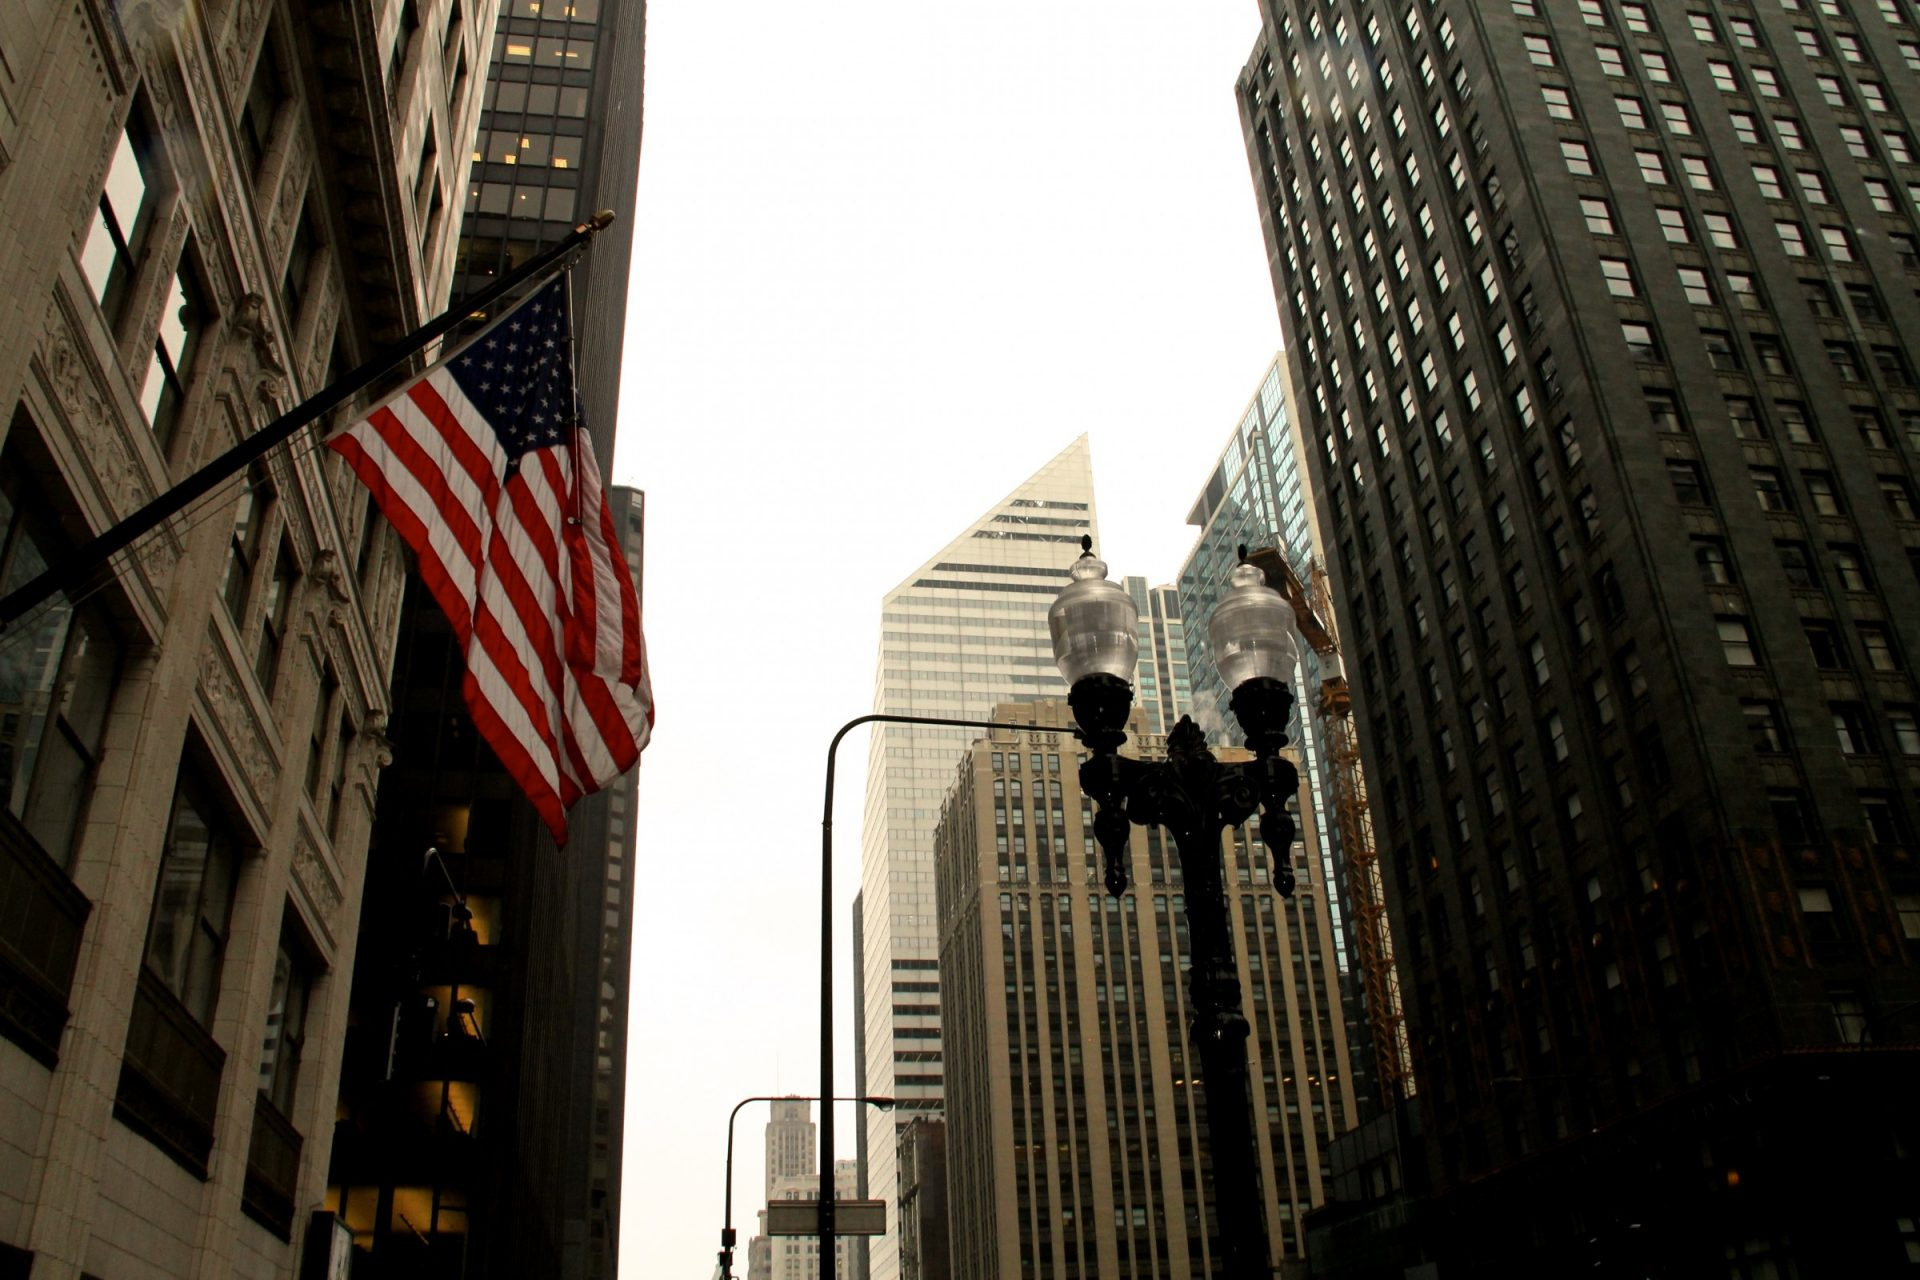 American Flag & Lamp Post Among City Buildings